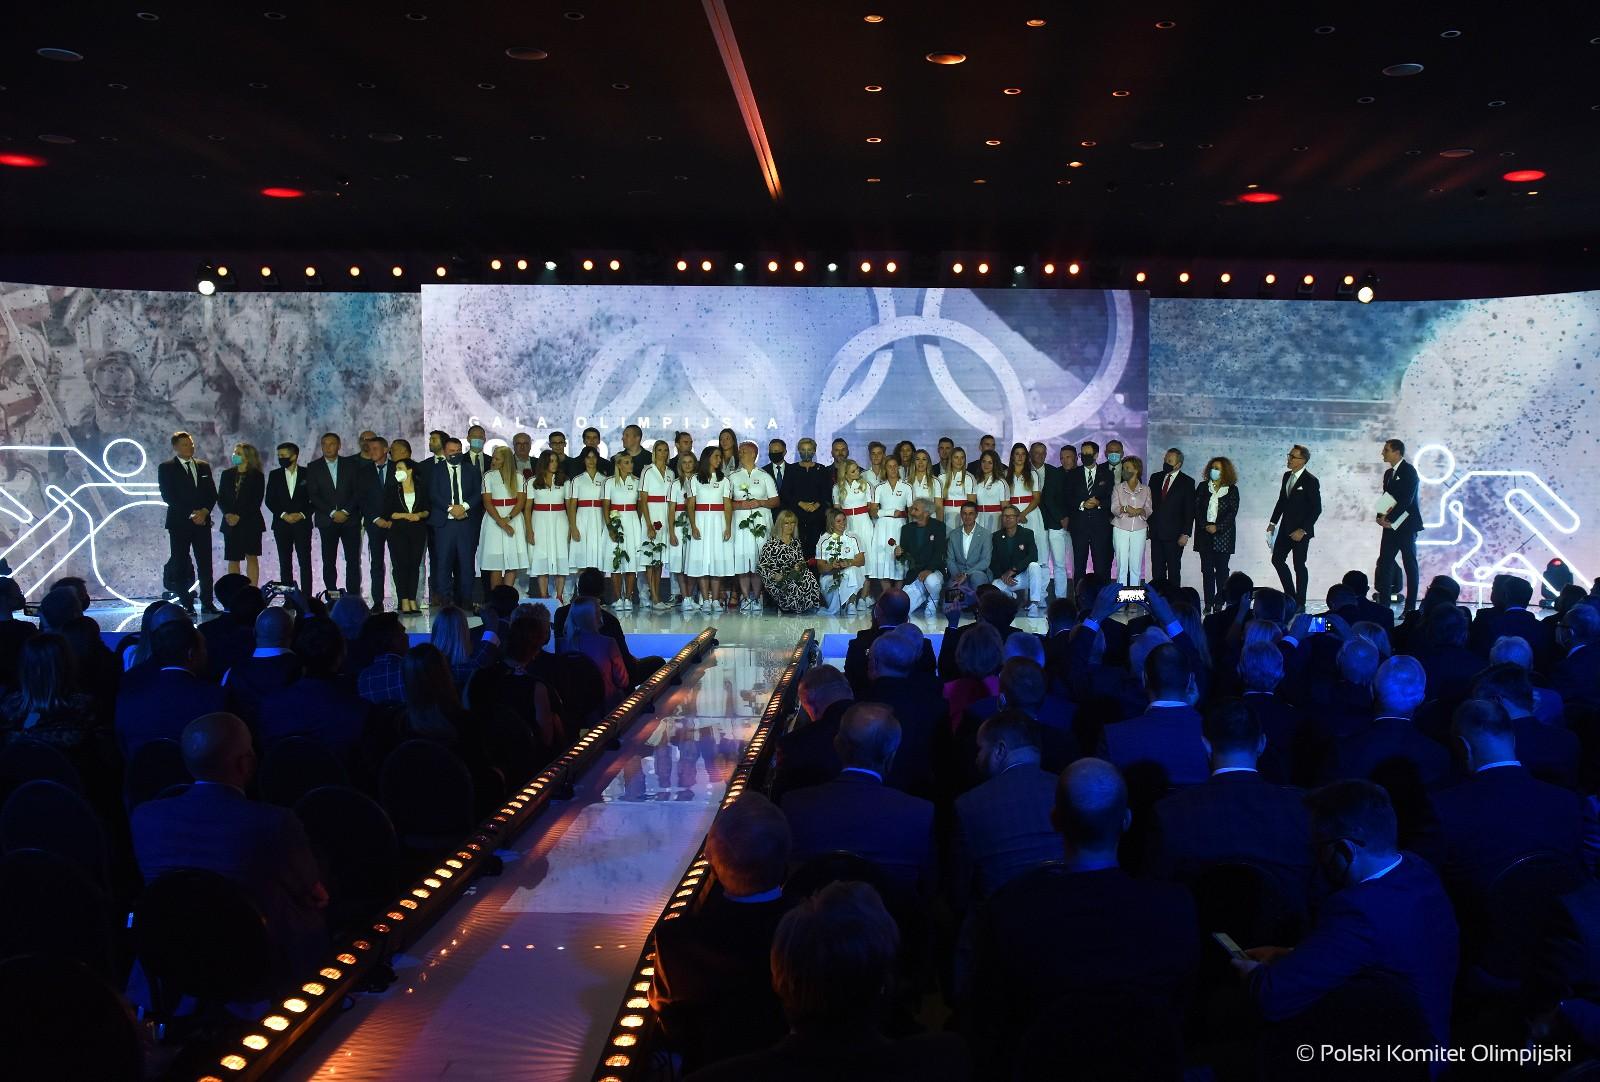 Gala Olimpijska Tokio 2020 – Polscy medaliści olimpijscy nagrodzeni